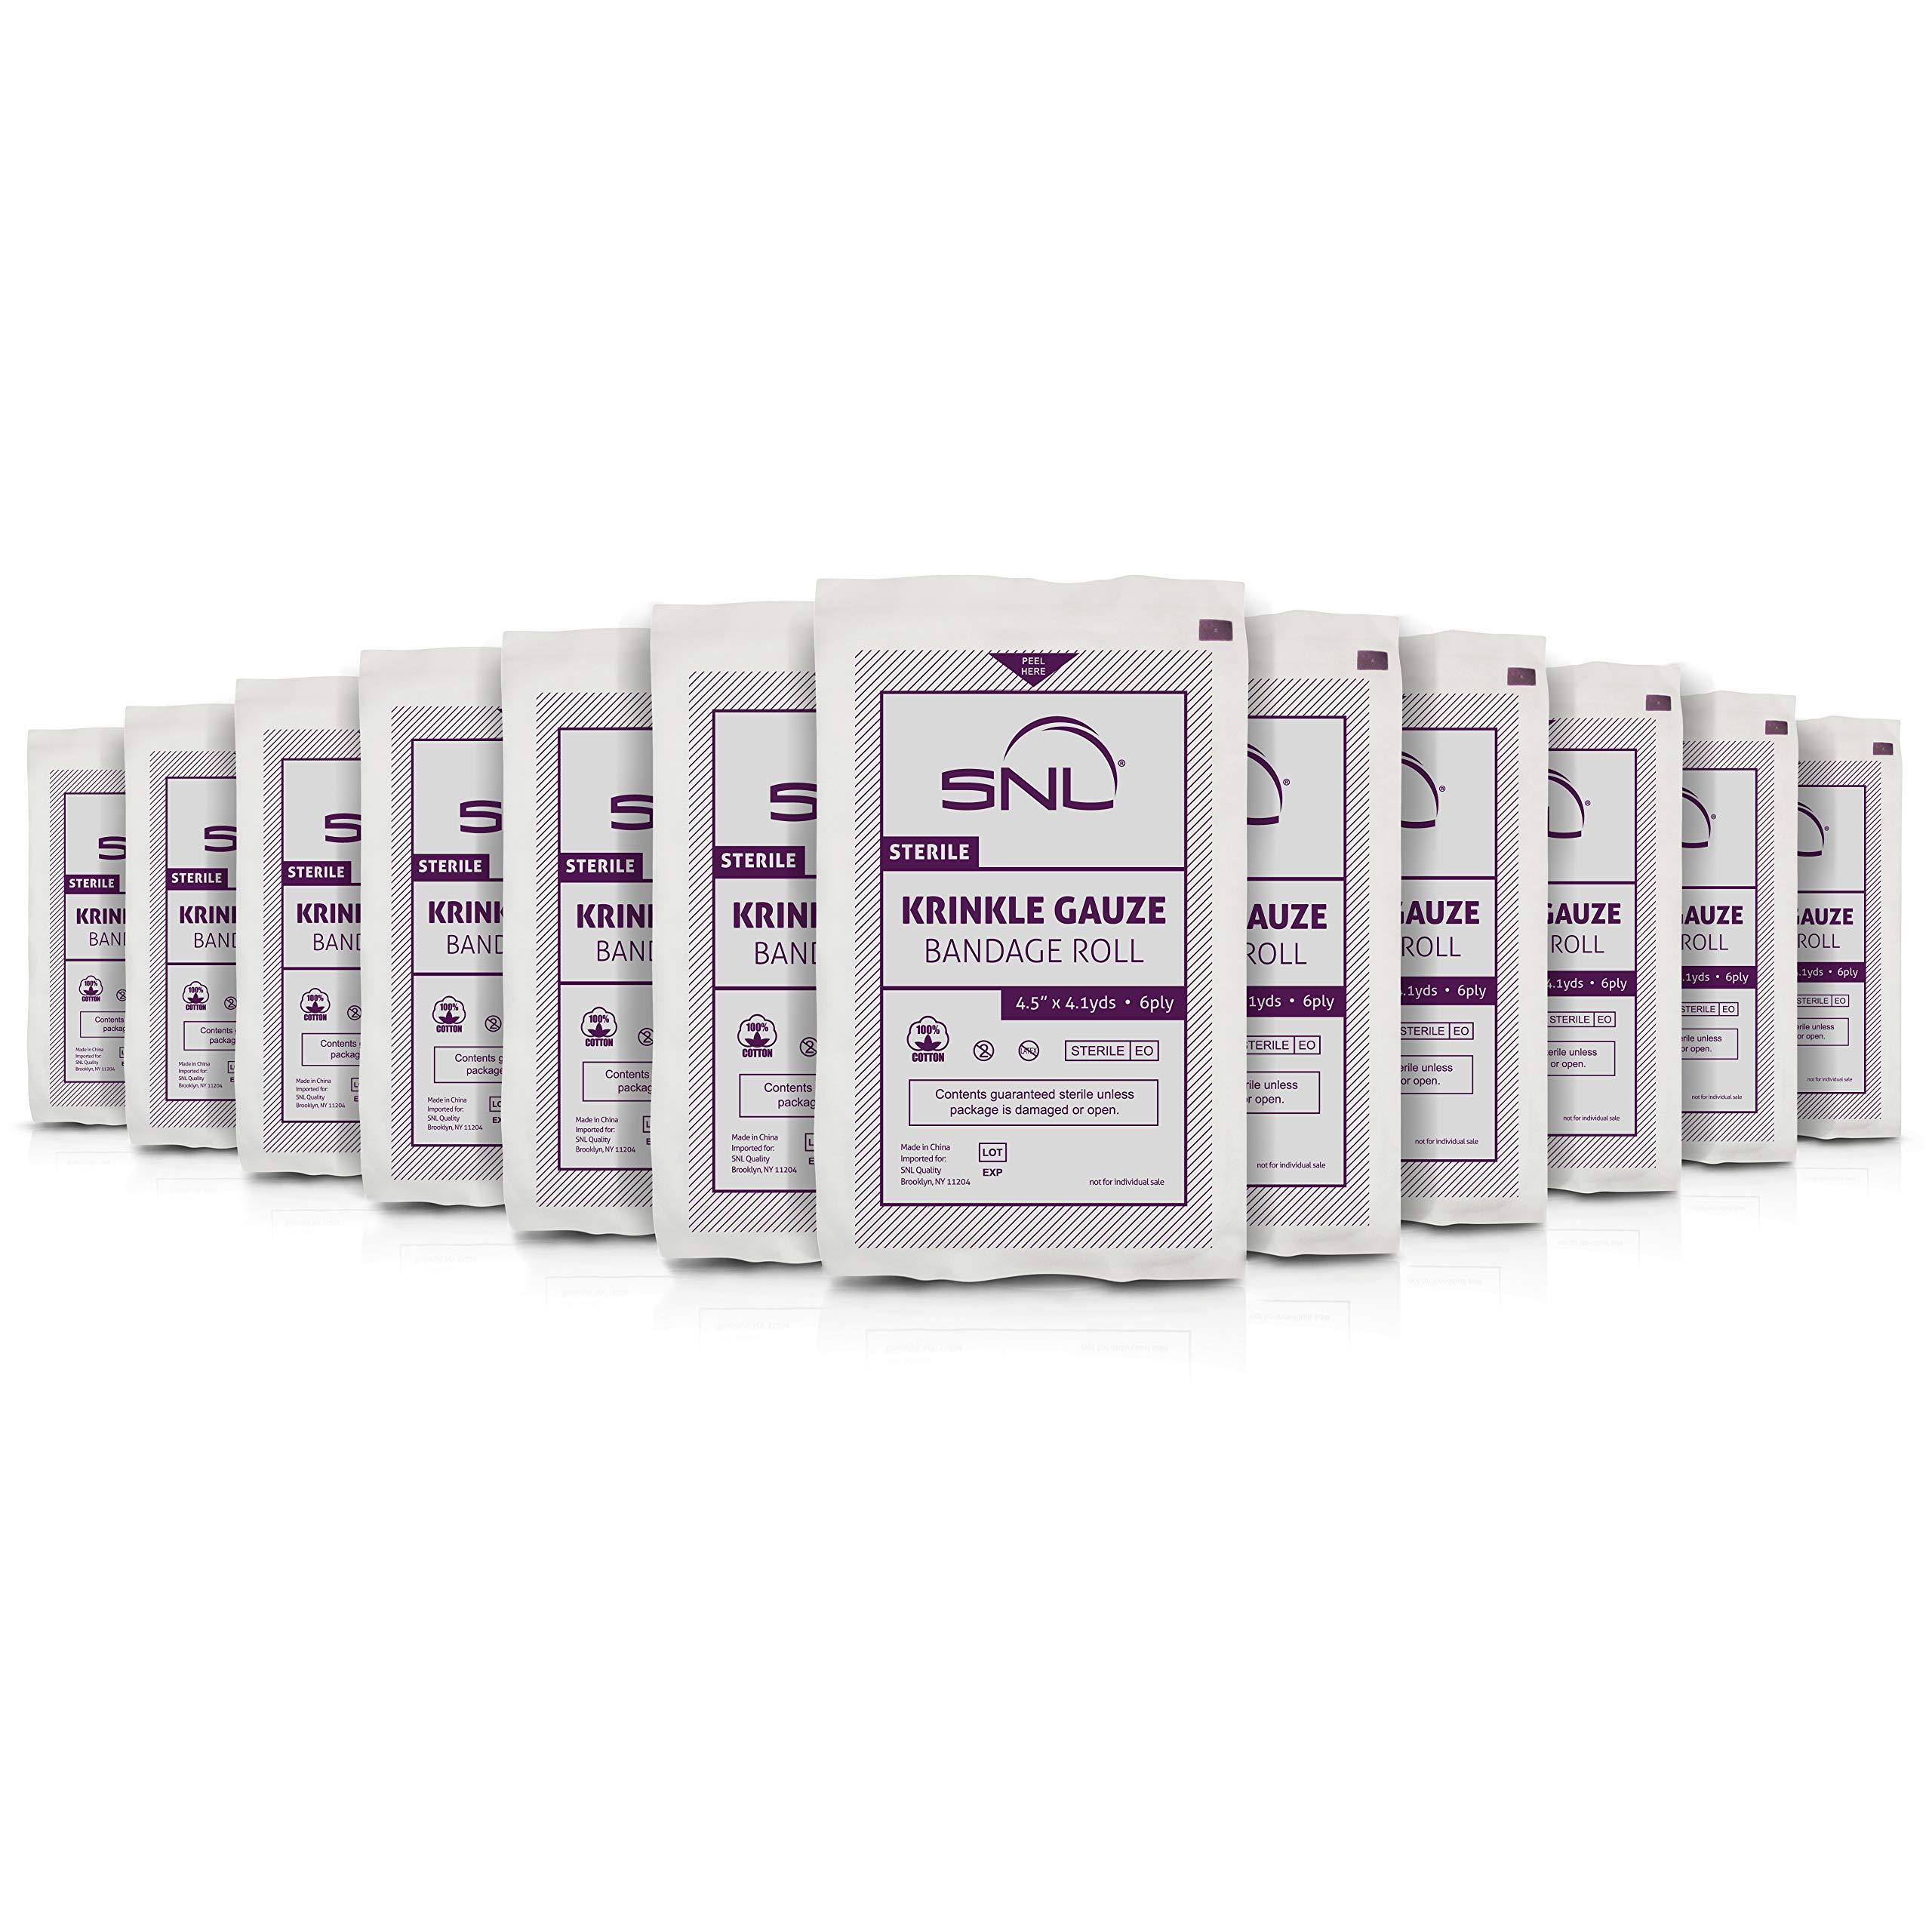 SNL Sterile Krinkle Kerlix Type 4 1/2'' x 4 1/8 Yds, Latex Free, Bandage Roll - Pack of 12 by SNL